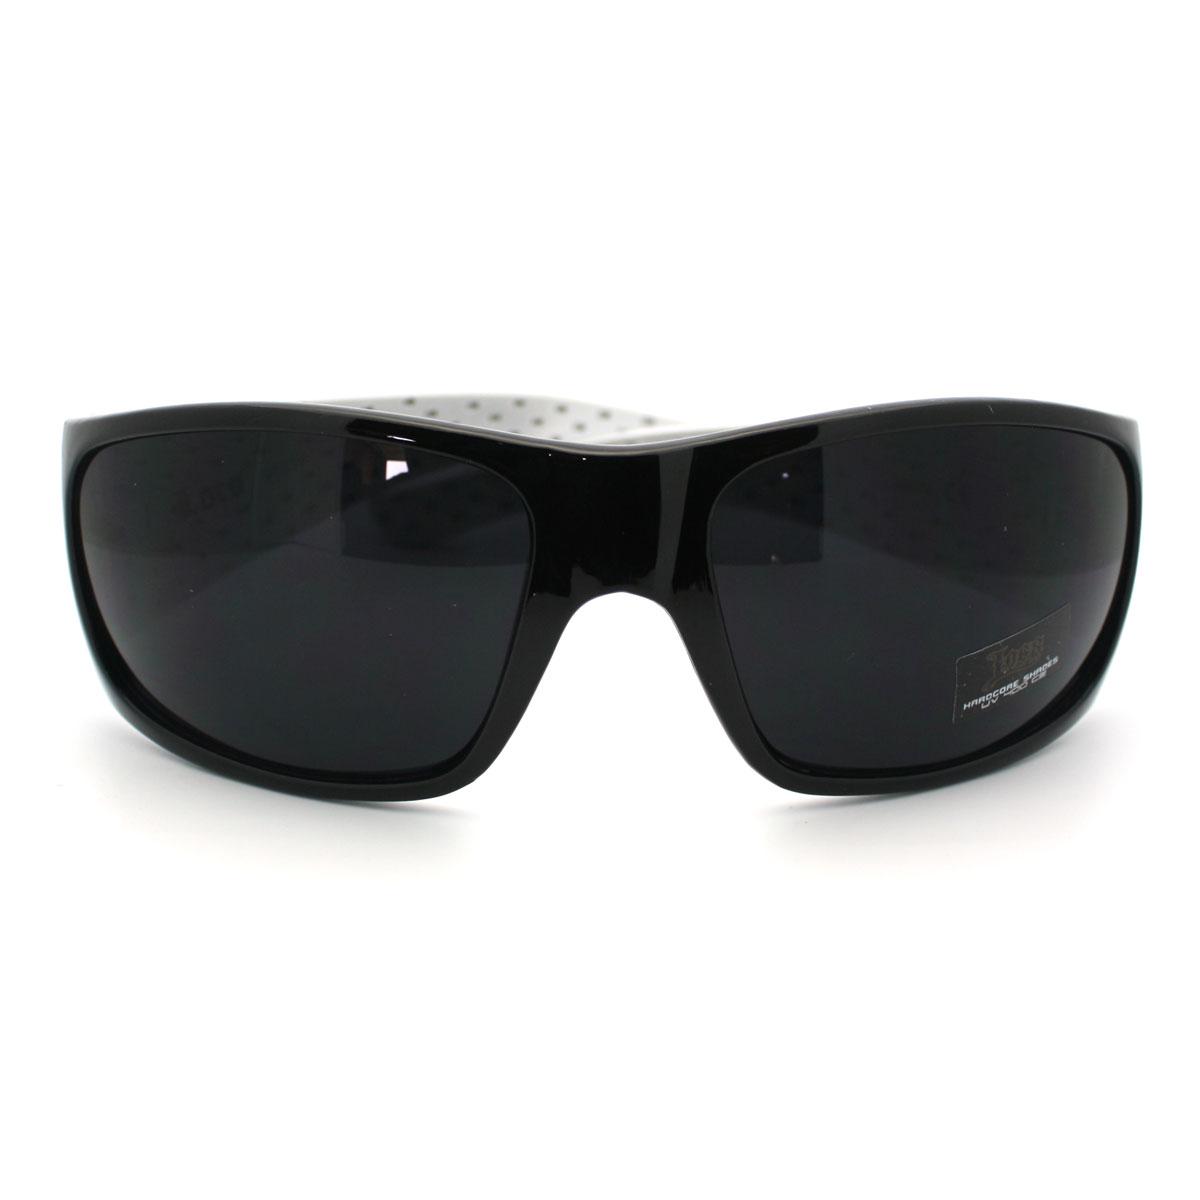 Mens Gangster Style Locs Sunglasses Oversized Dark Black ...